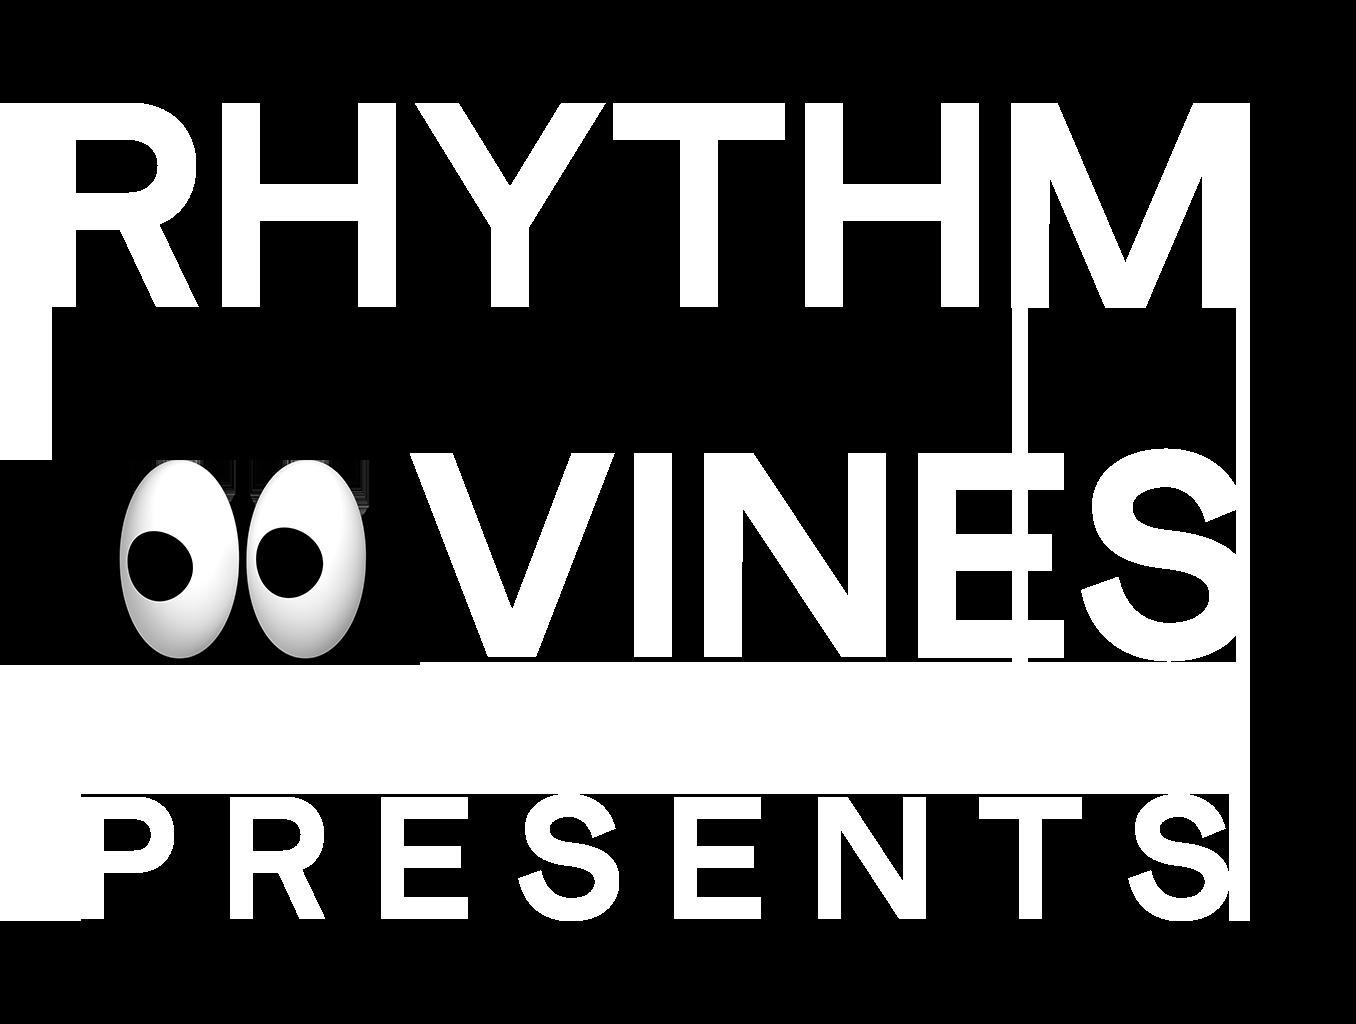 RhythmVinesPresents.png